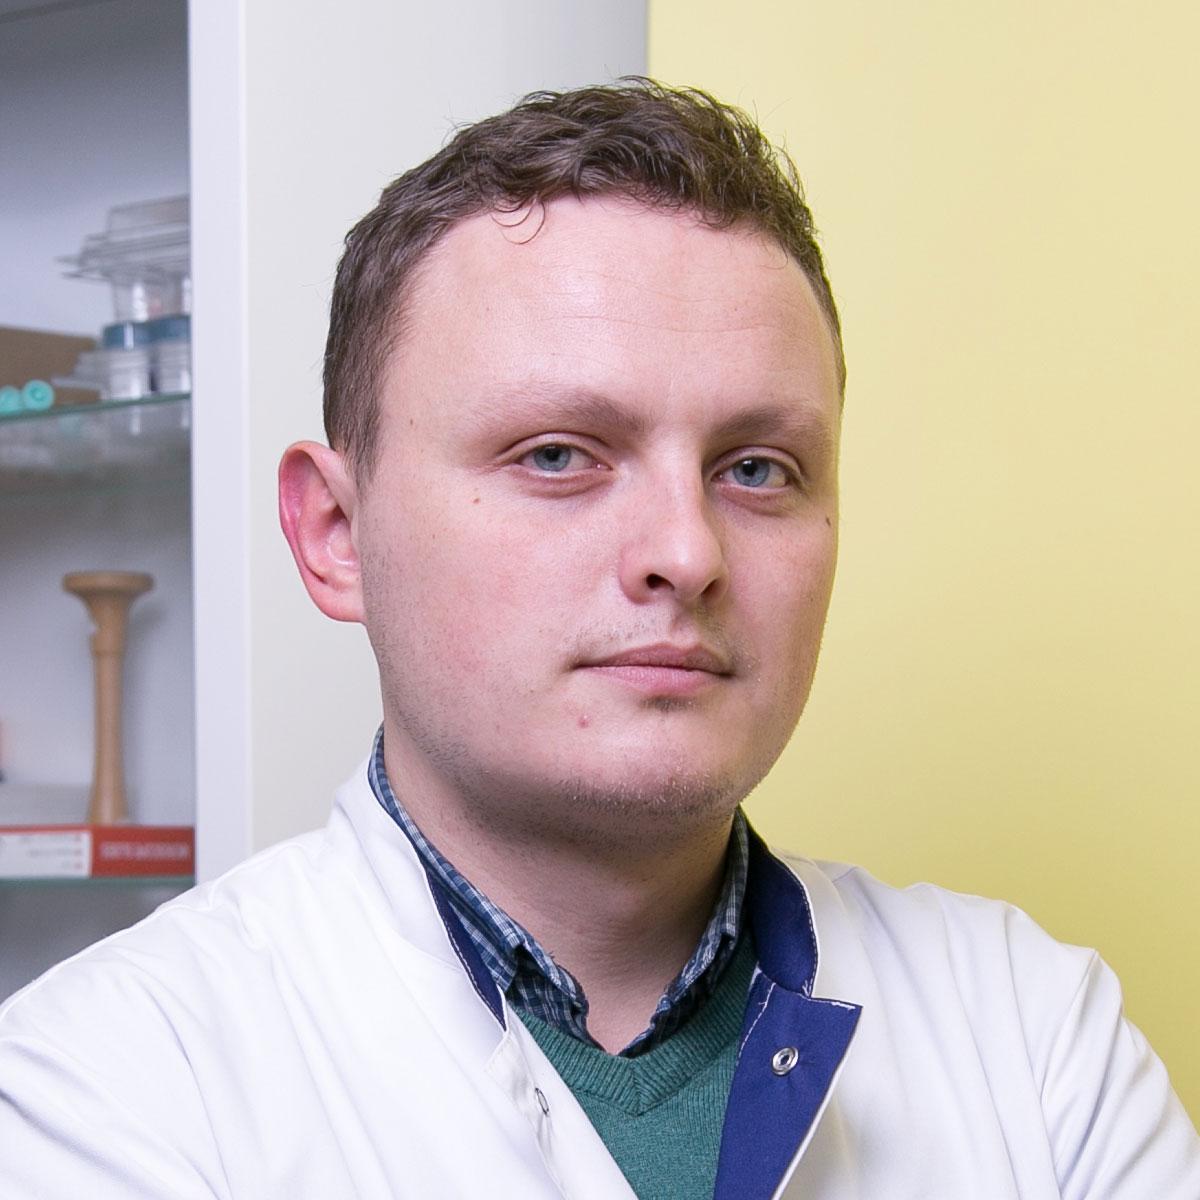 Агафонов Константин Игоревич